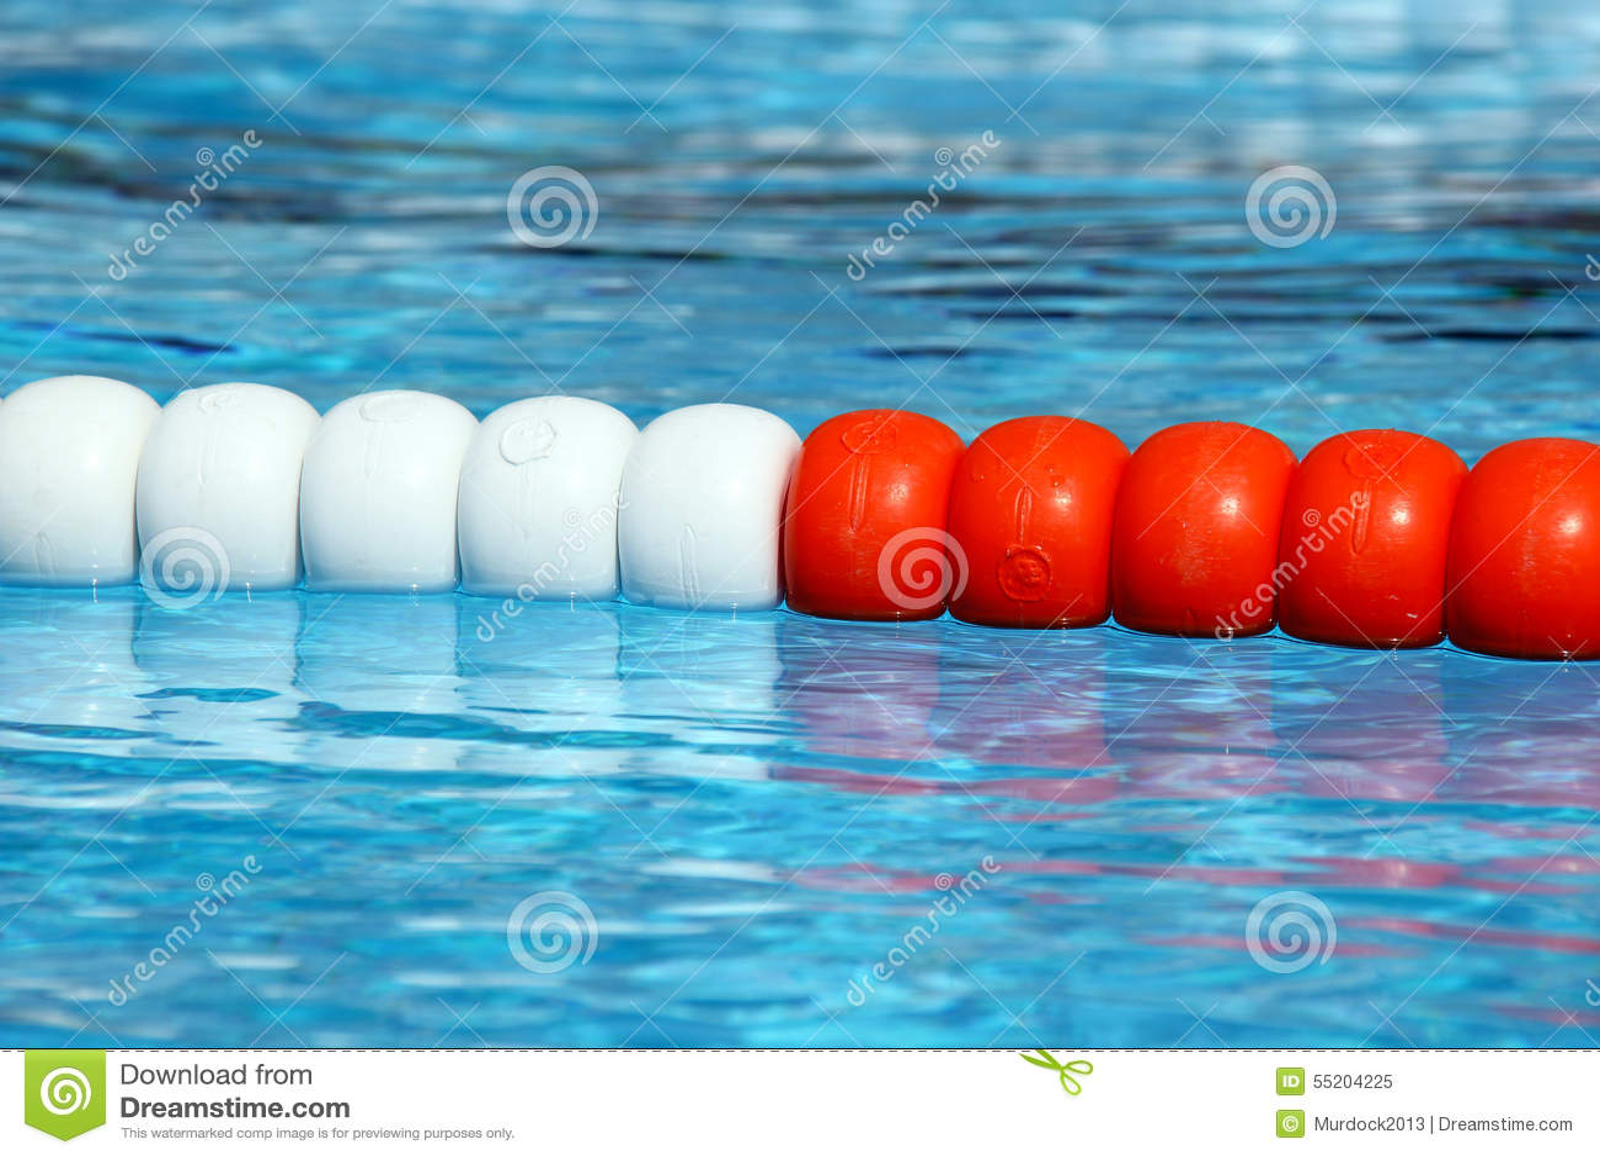 Swimming Pool Lane Ropes Stock Photo Image 55204225